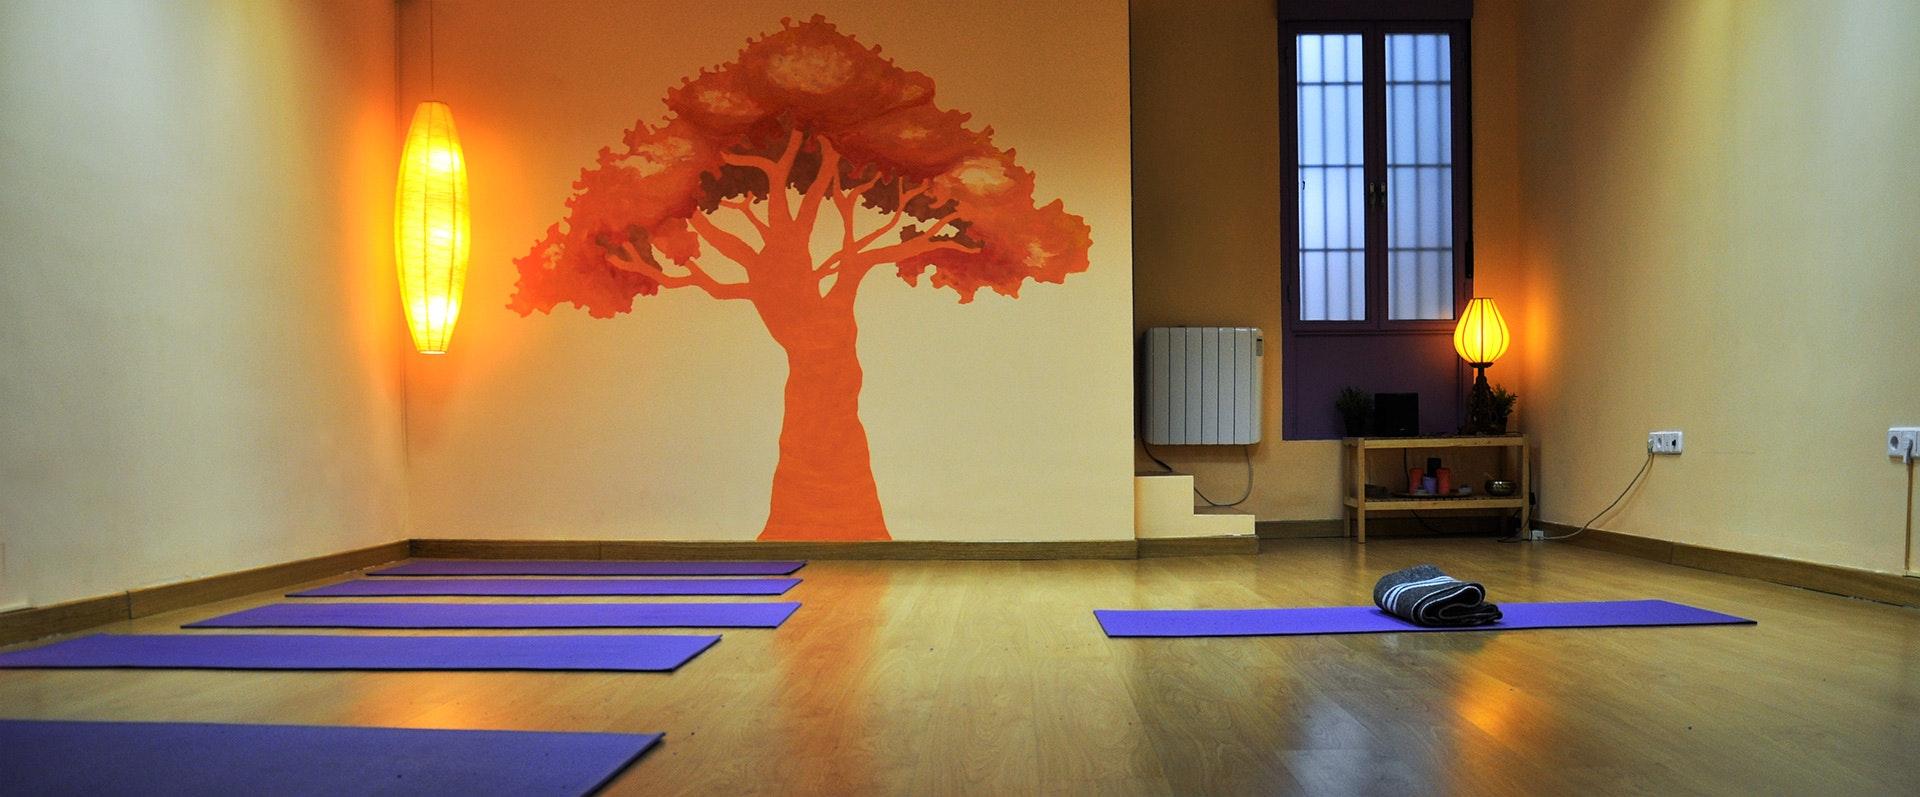 Foto 2 Oferta Gimnasio Dalmai yoga Madrid - GymForLess